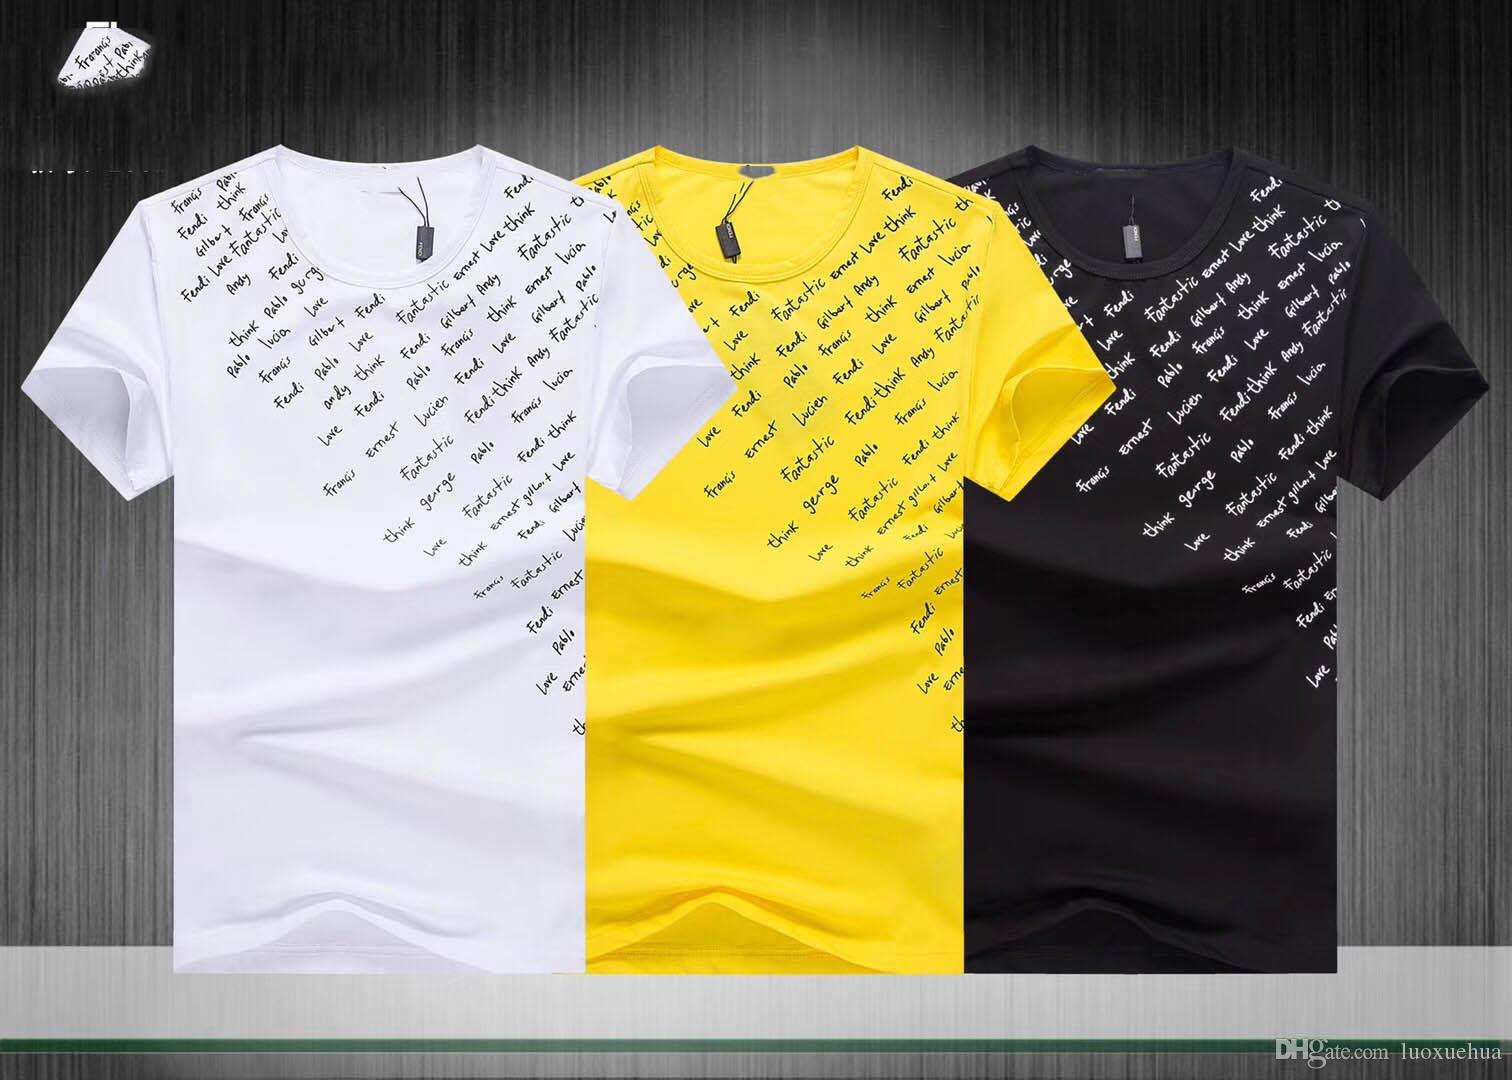 Hombres De Alta Compre 2019 100 Calidad Algodón Camisetas Para Zq1E5pwE